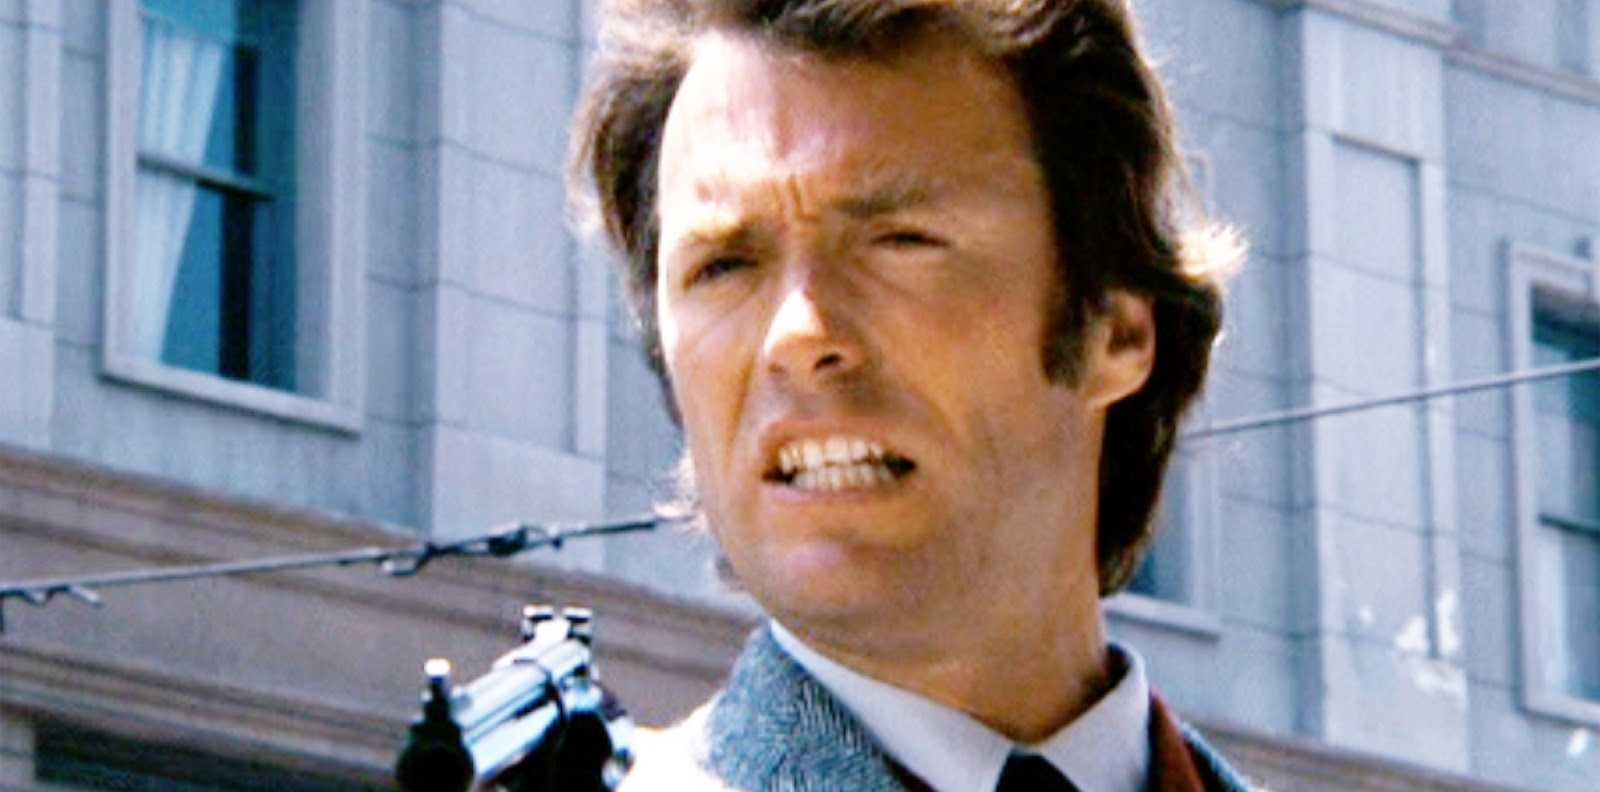 Dirty Harry role still haunts Eastwood at 87 | Seniors News